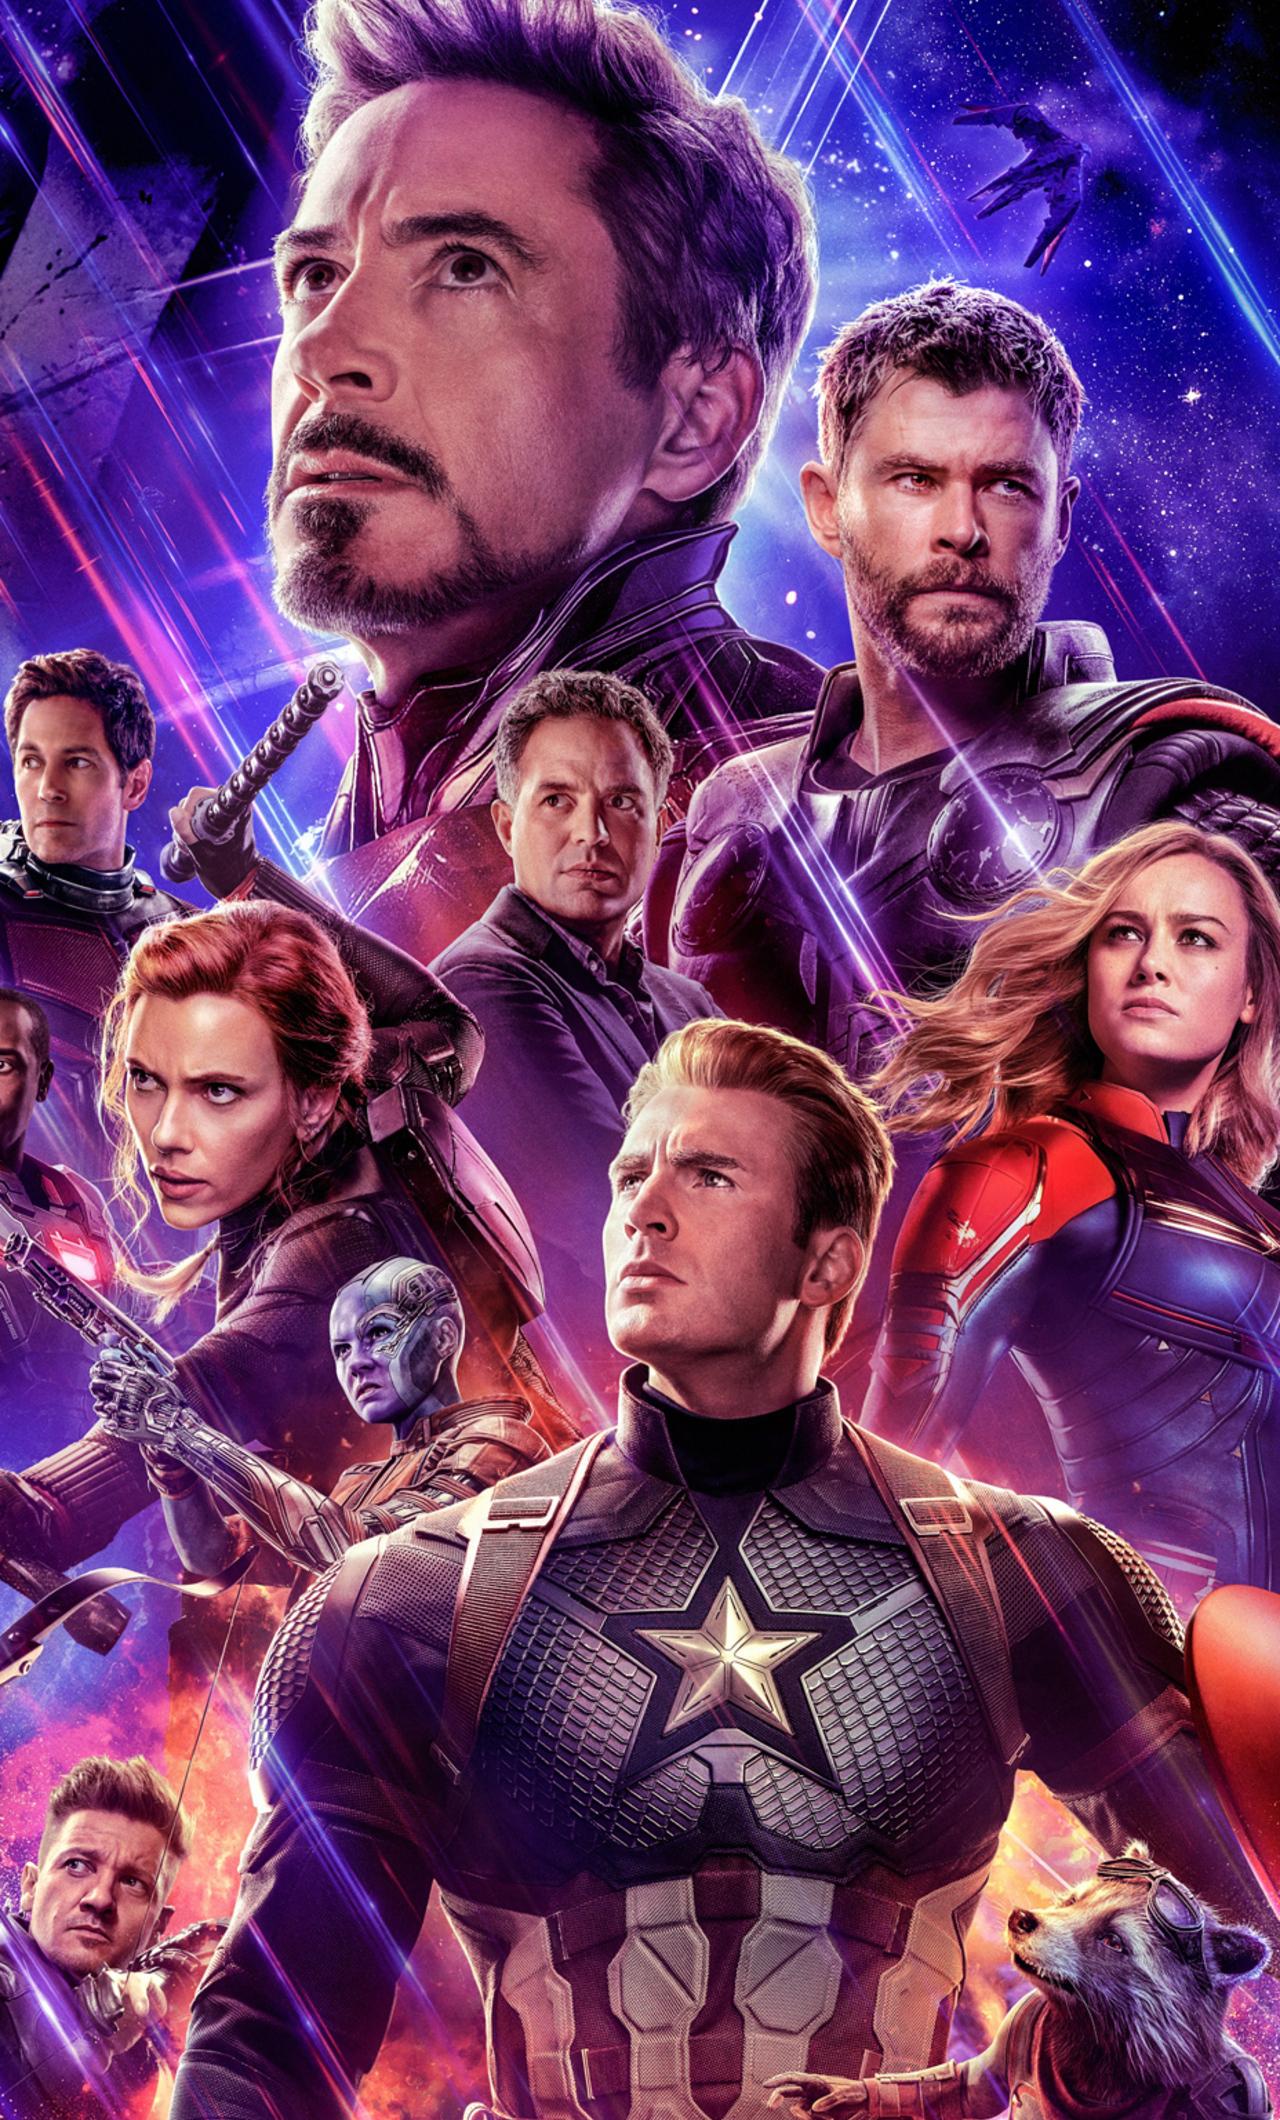 48+ Avengers Endgame Hd Wallpaper For Mobile Download Gif